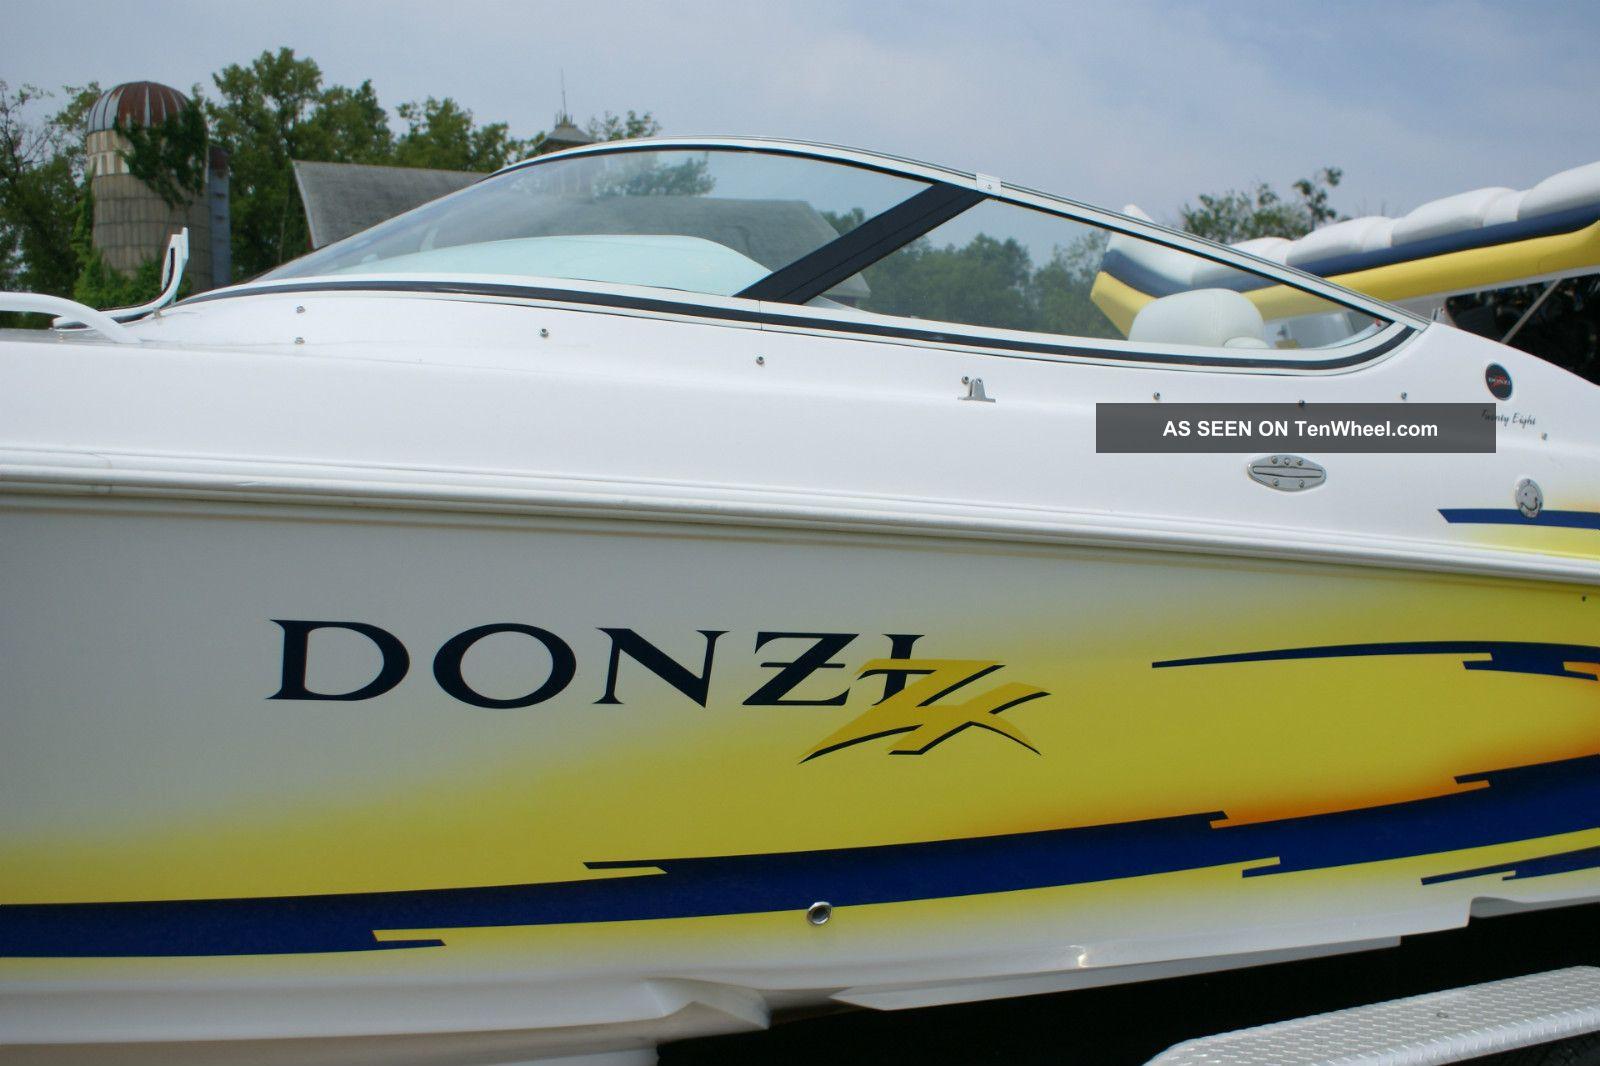 2005 Donzi 28 Zxo Other Powerboats photo